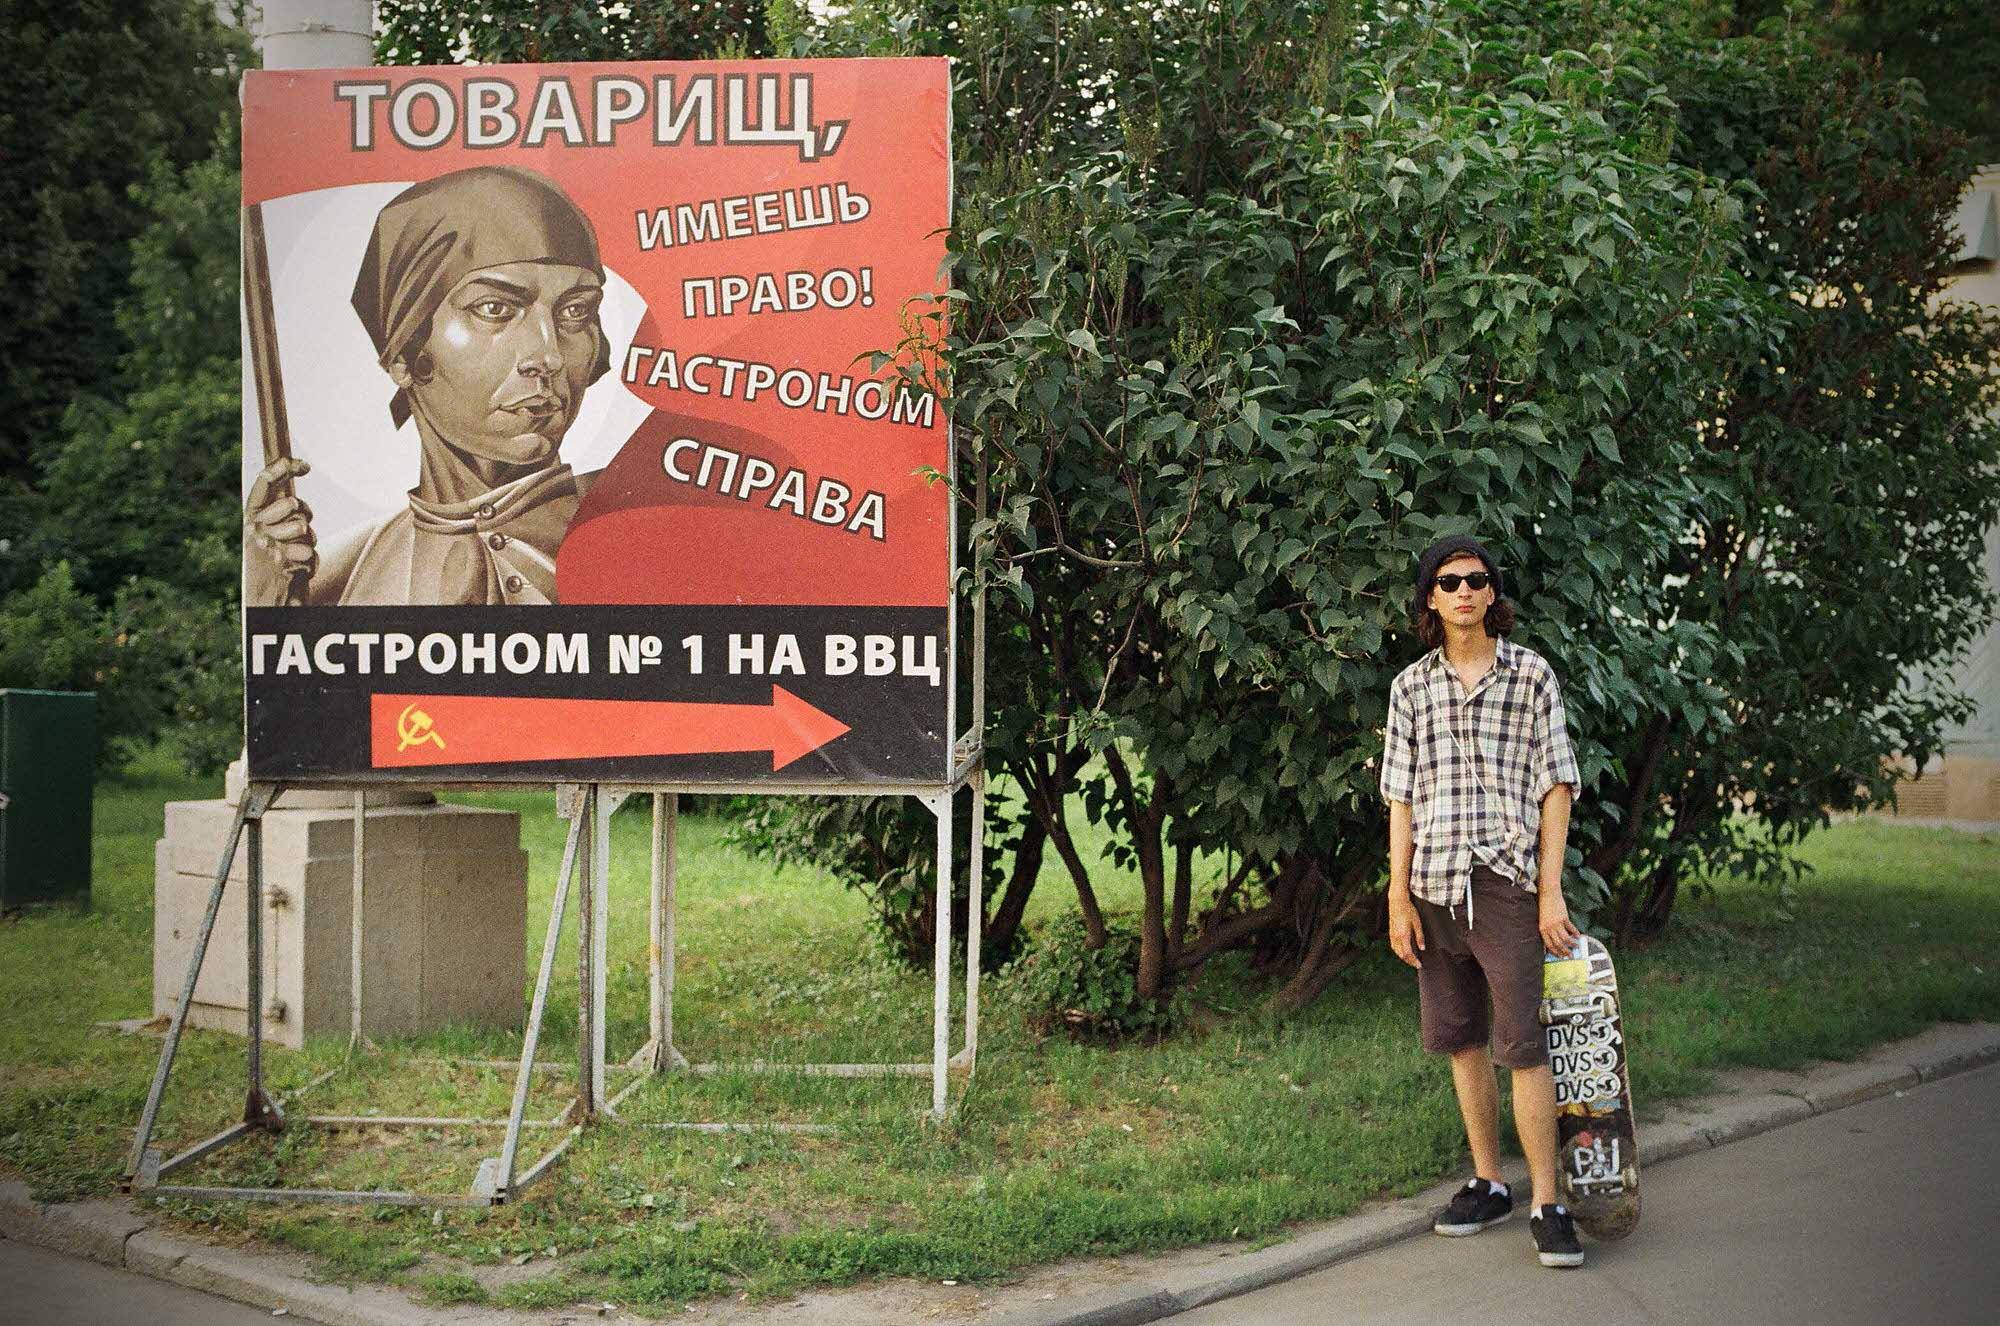 35mmPatrikWallner_Moscow_TobapnwLOWQ